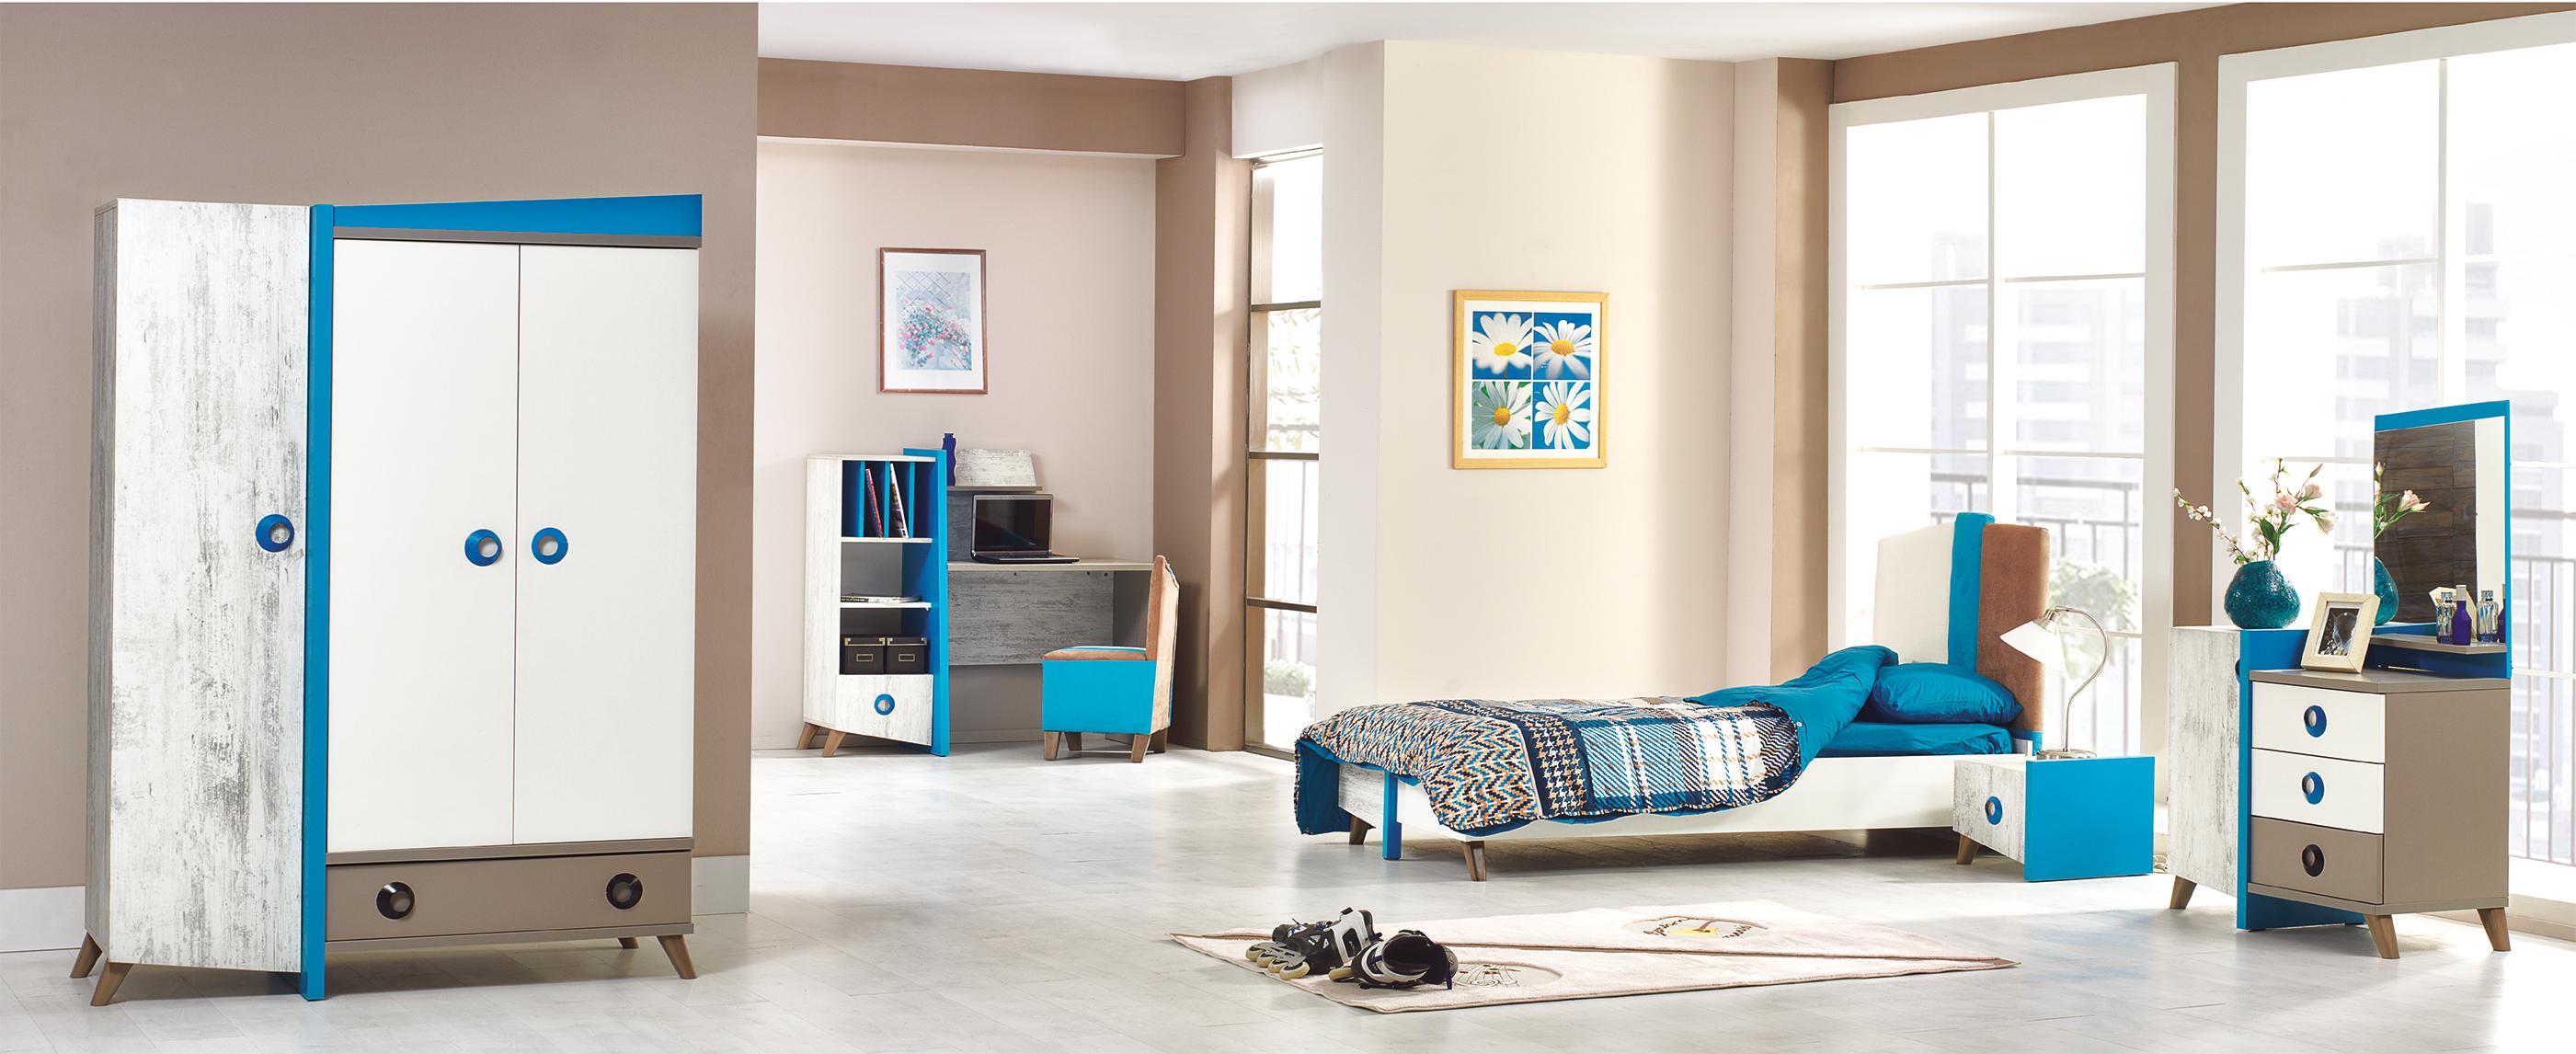 chambre ikon petit prix nkl meuble wassa et deco. Black Bedroom Furniture Sets. Home Design Ideas